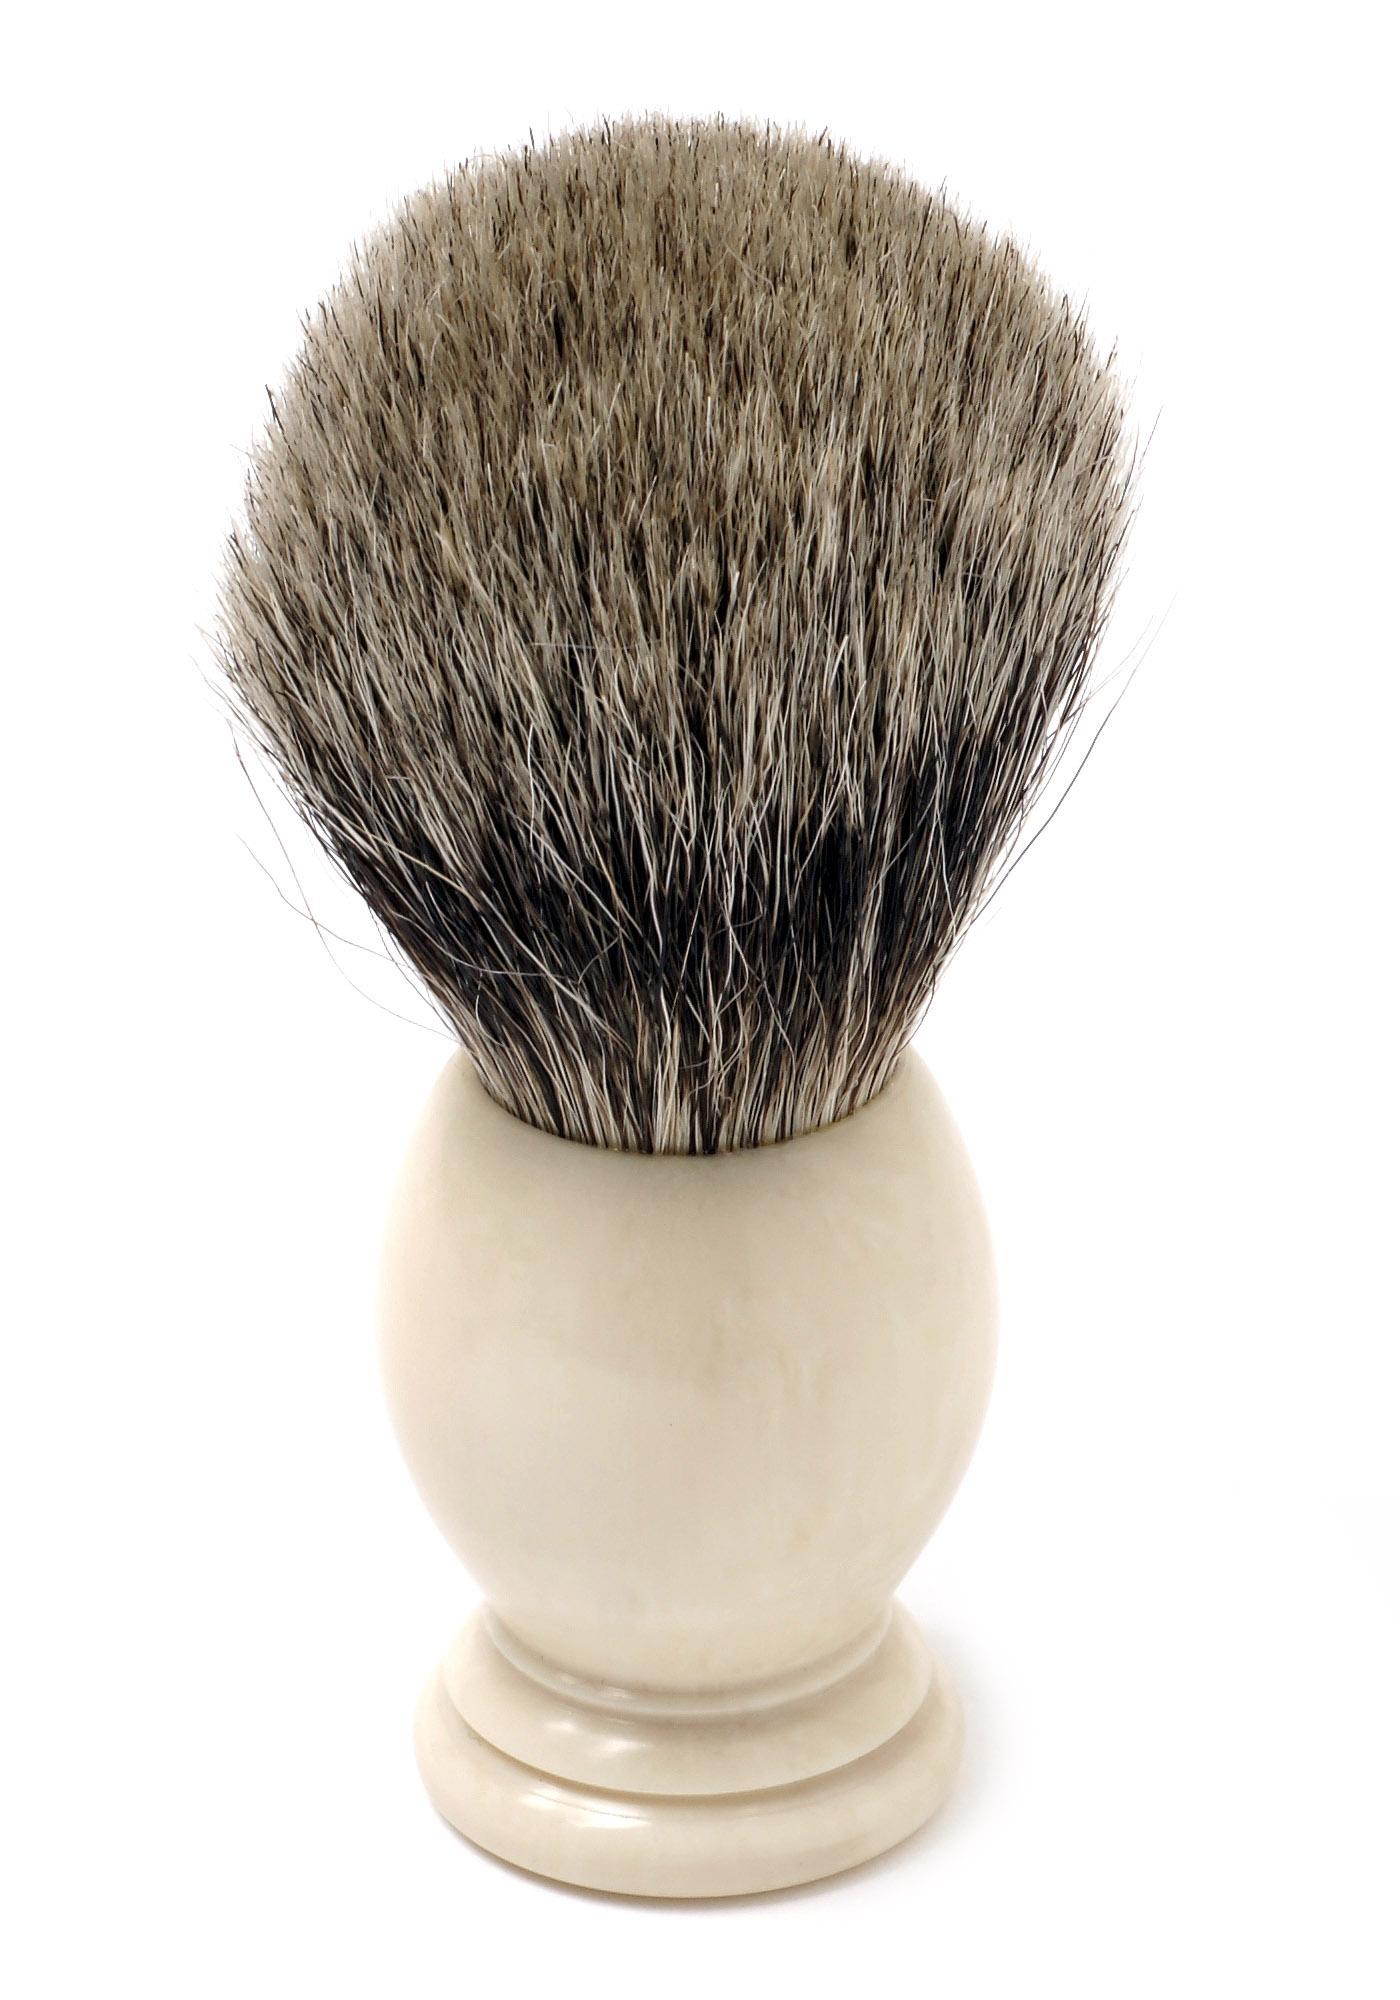 Shave Brush Wikipedia